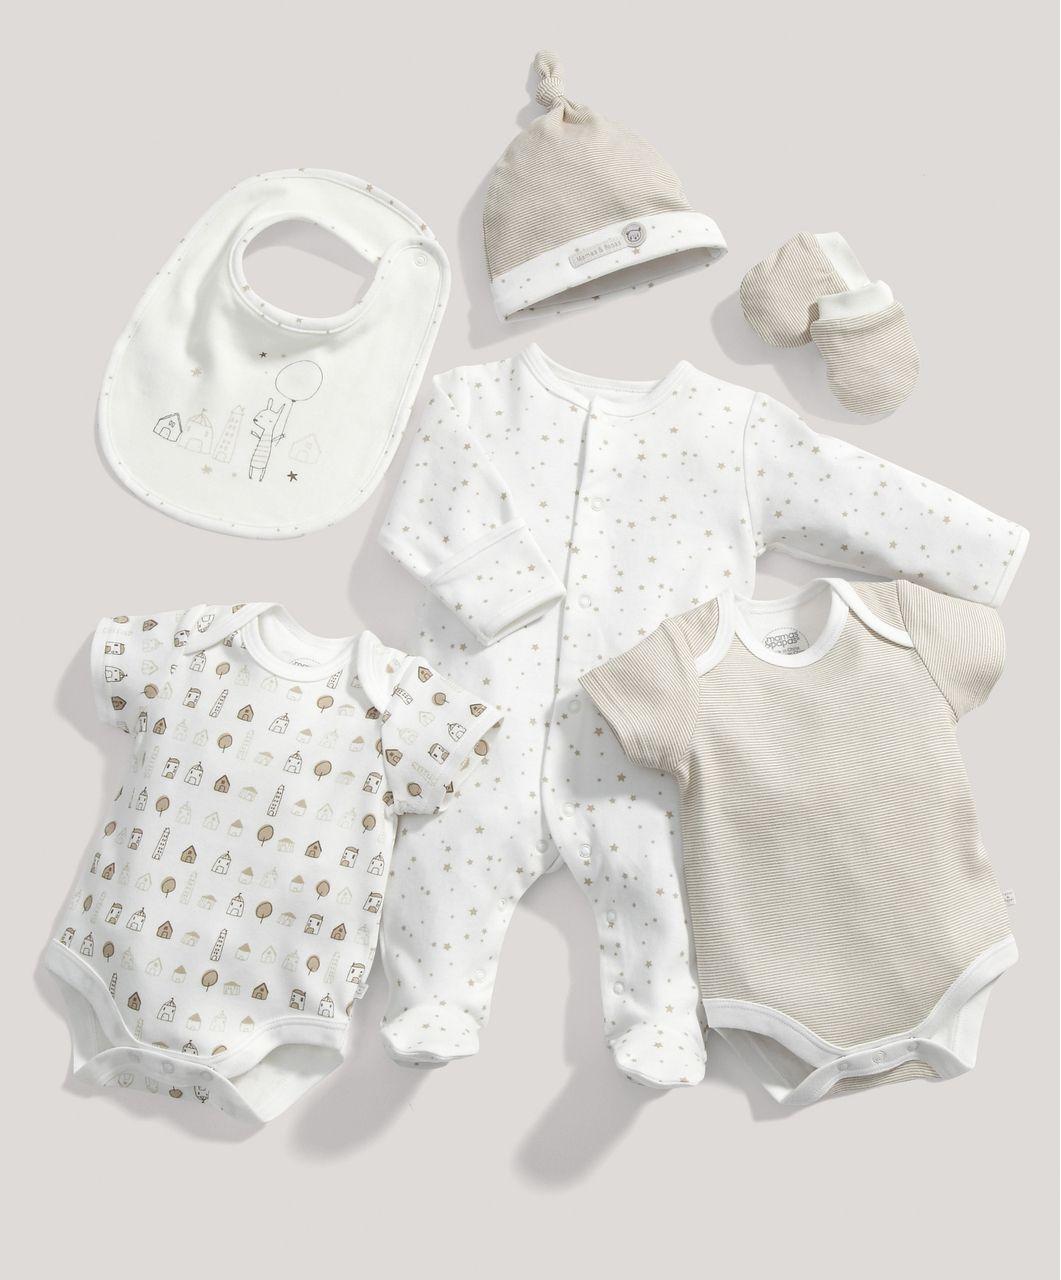 Mamas /& Papas Baby Clothing Set